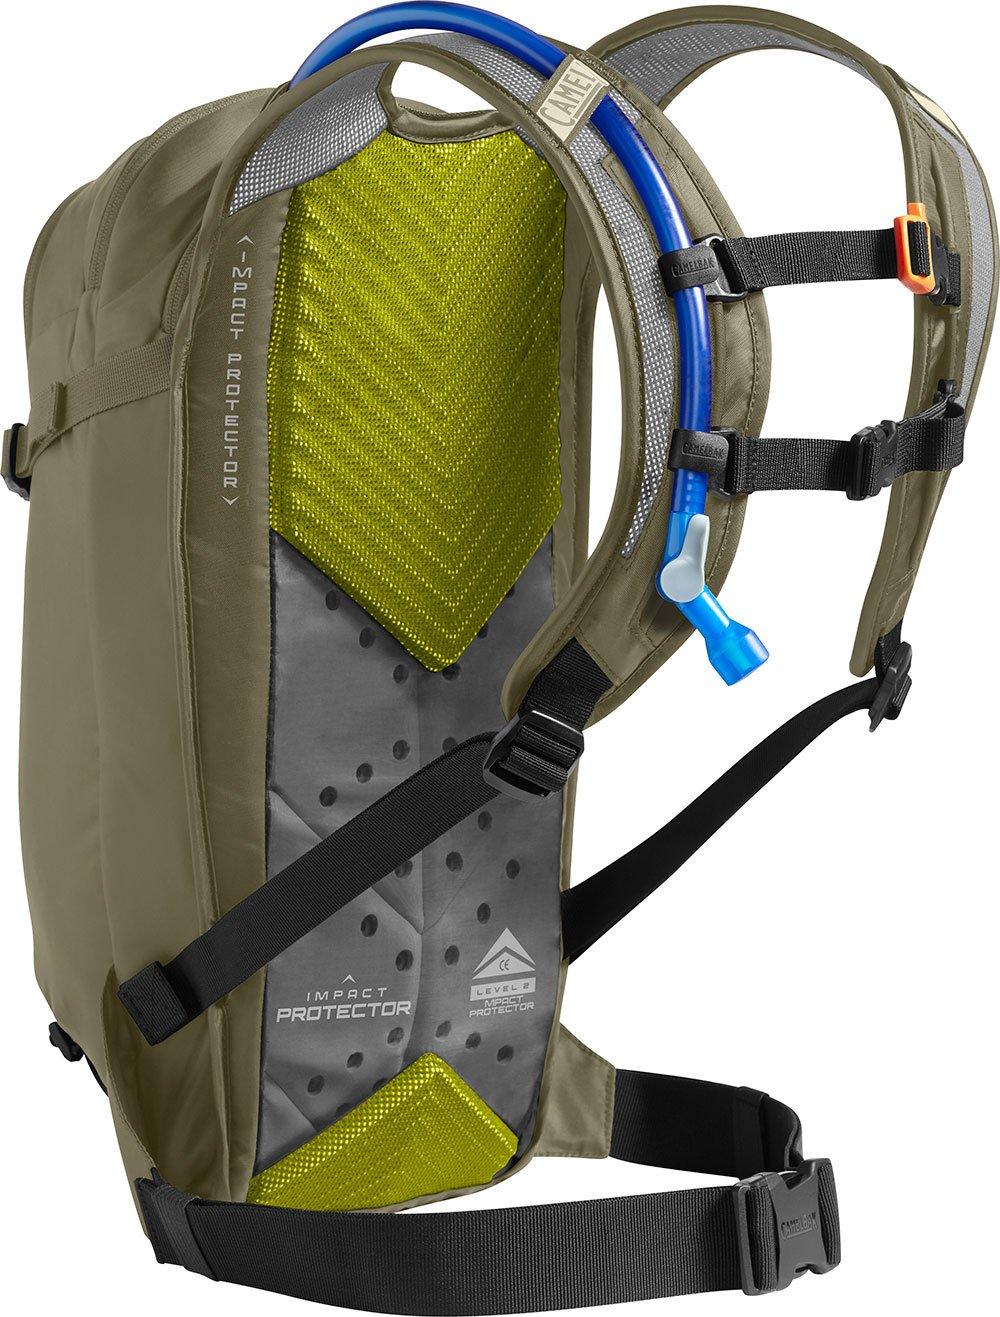 CamelBak T.O.R.O 100oz Protector 14 Hydration Pack